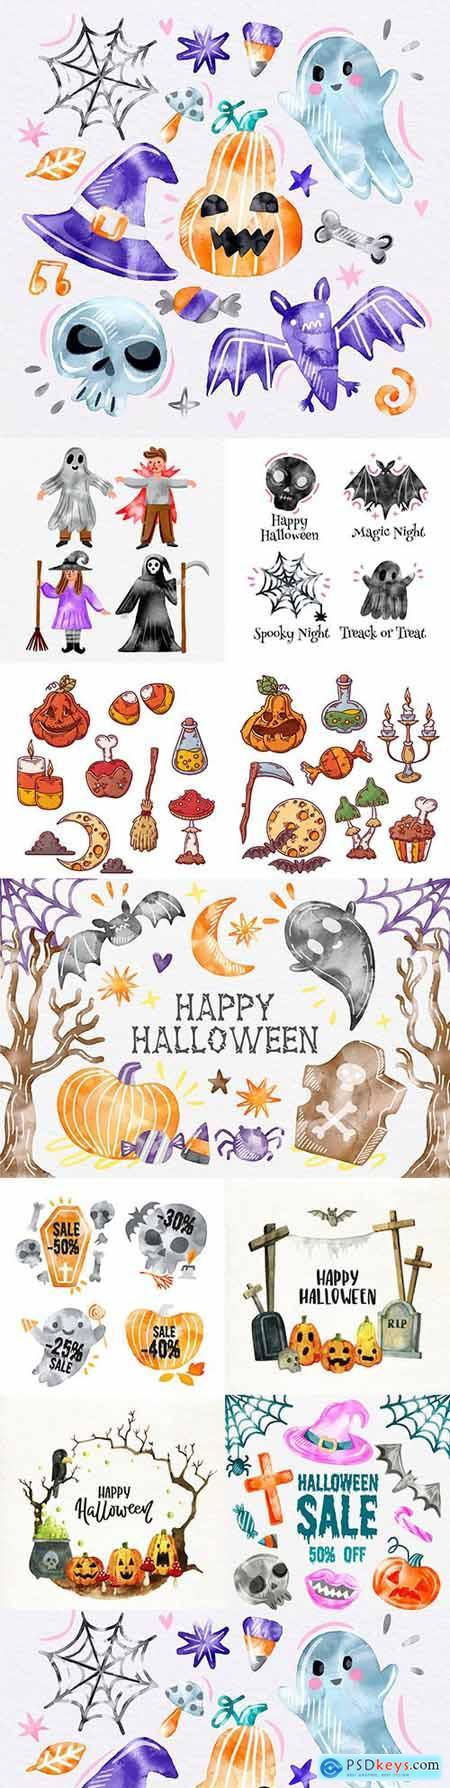 Halloween cute cartoon character watercolor illustration